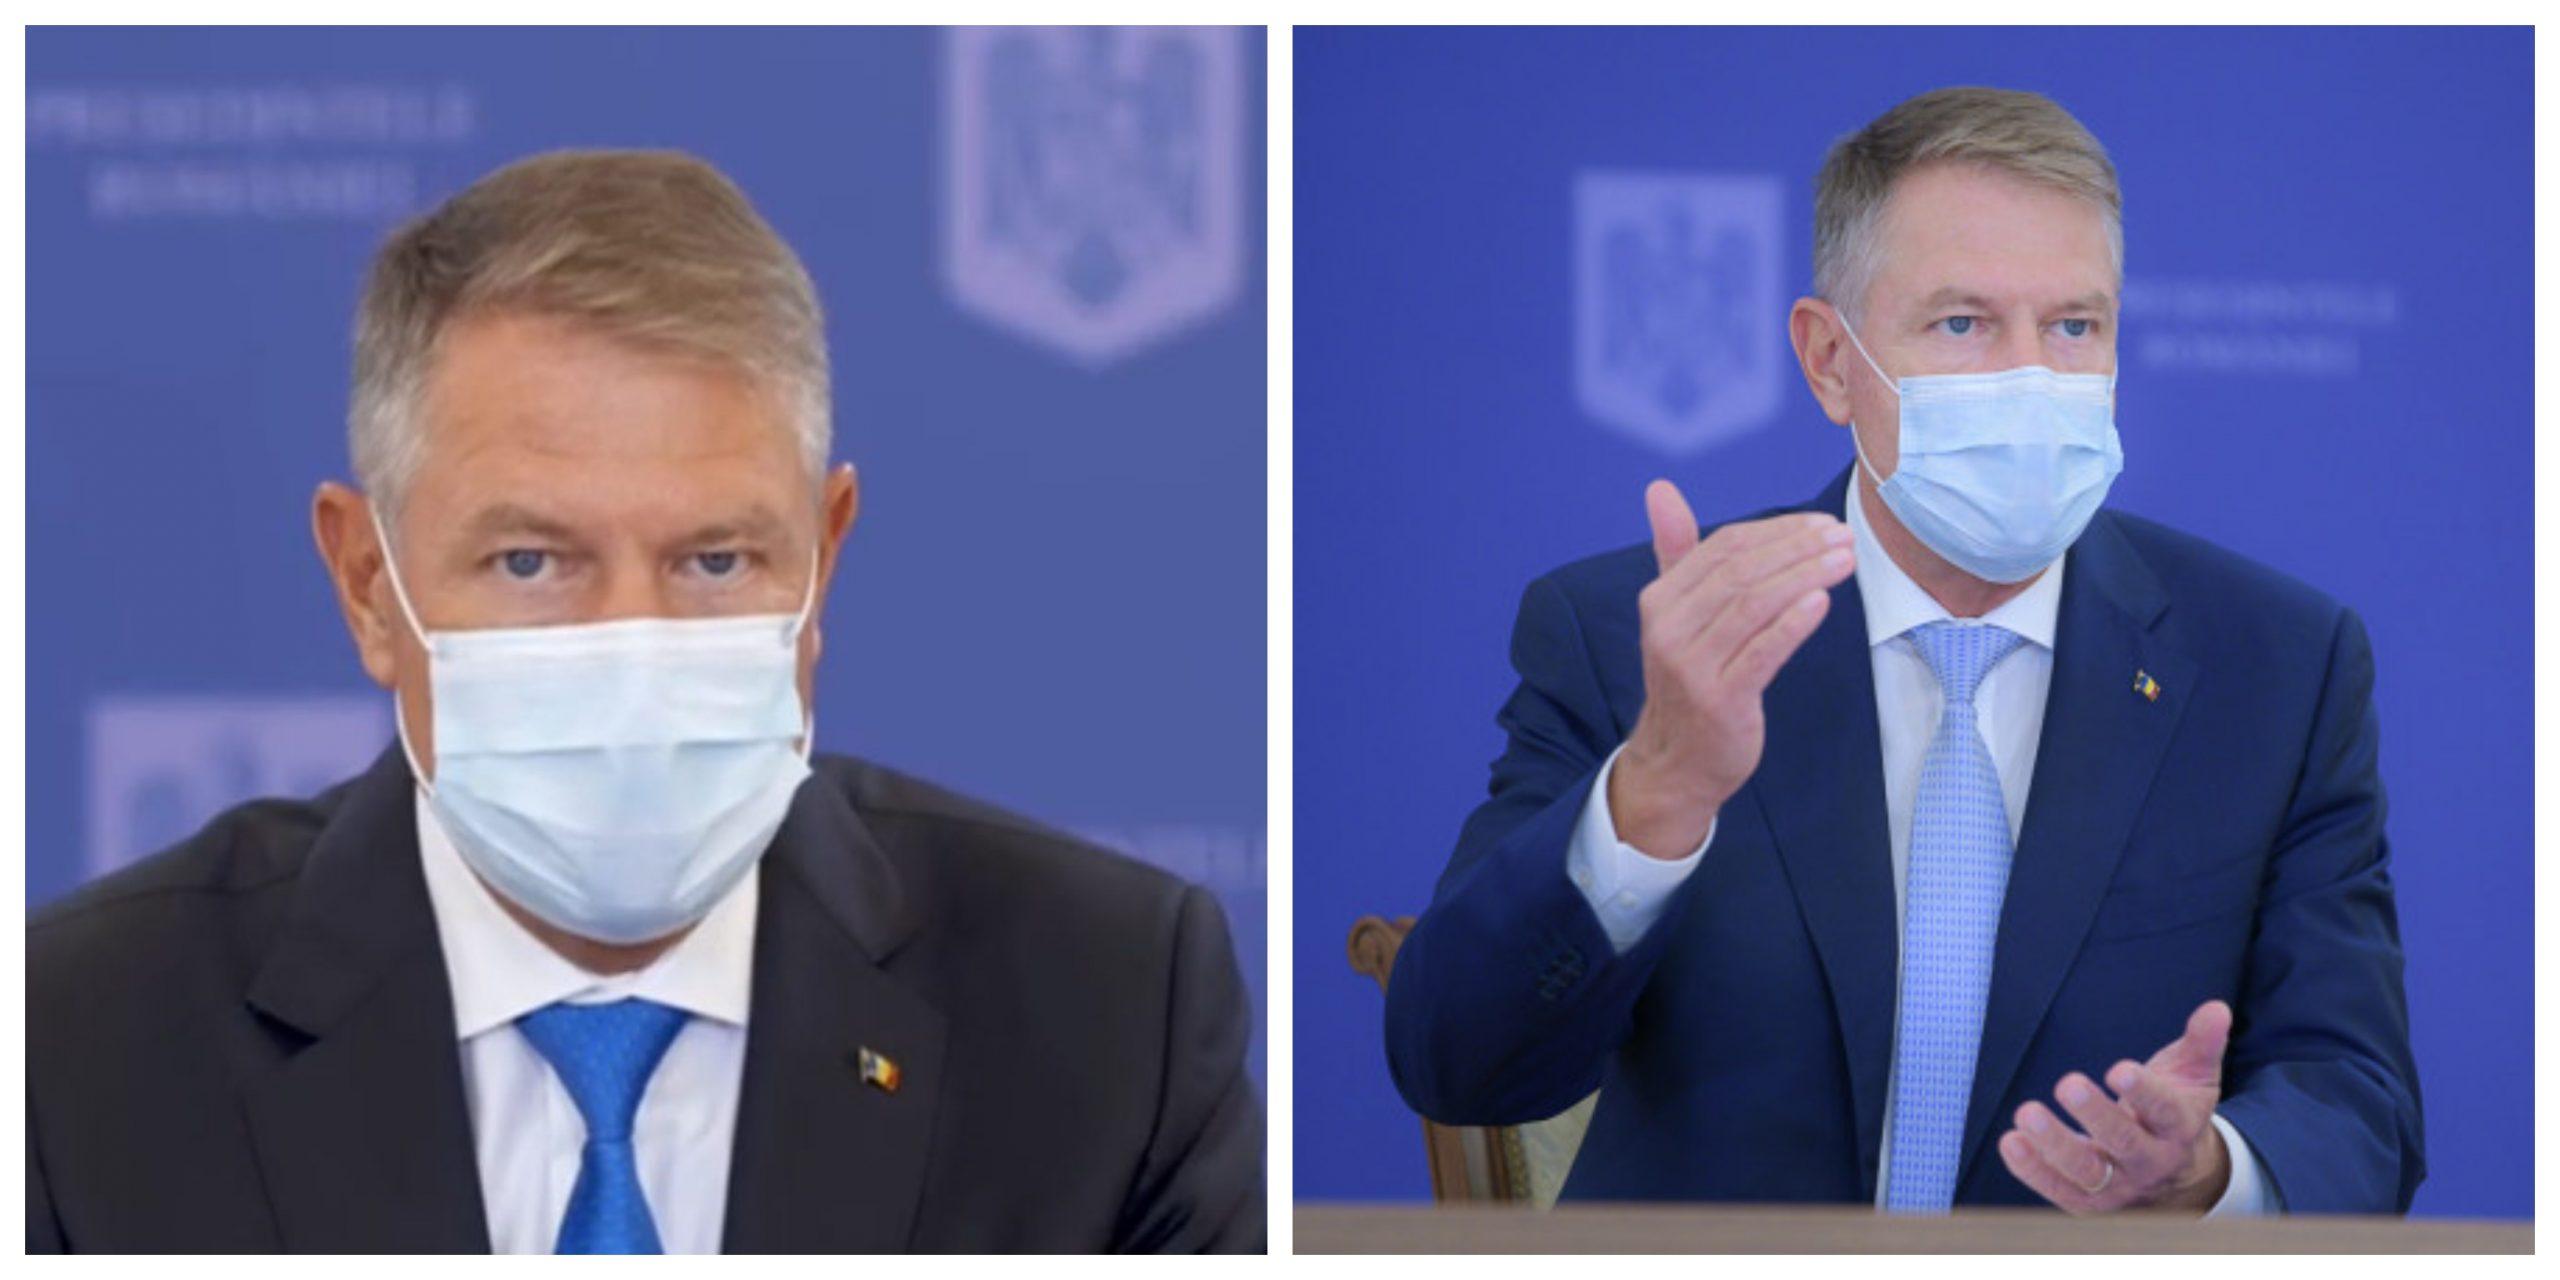 Klaus Iohannis, conferință de presă la ora 18.00. Declarații importante